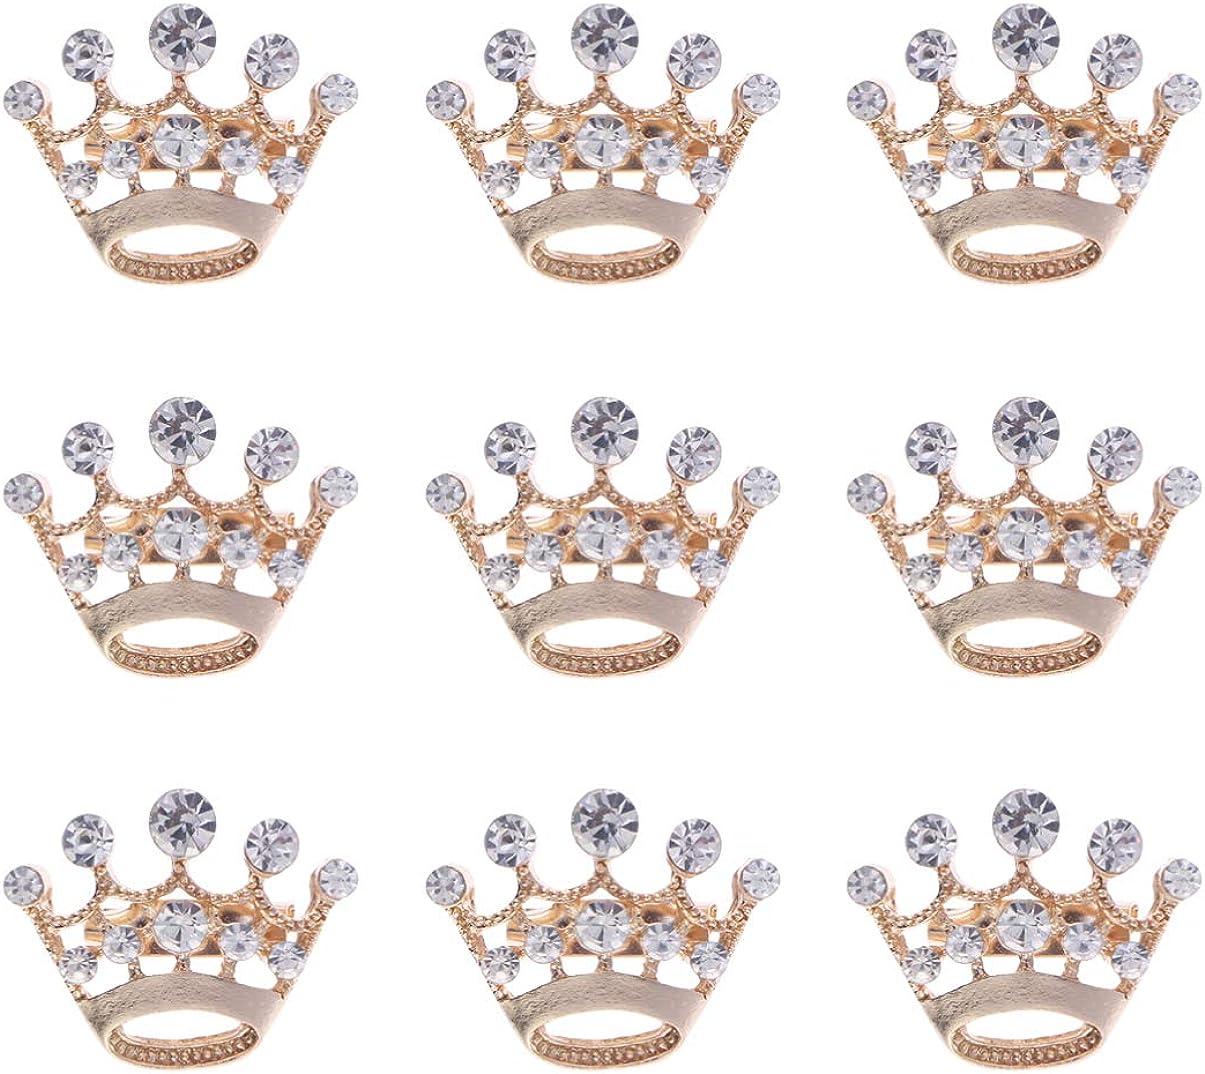 12pcs Elegant Crown Brooch Pin Rhinestone Crystal Corsage Brooch Pin Diamante Crown Brooch for Women Wedding Supplies